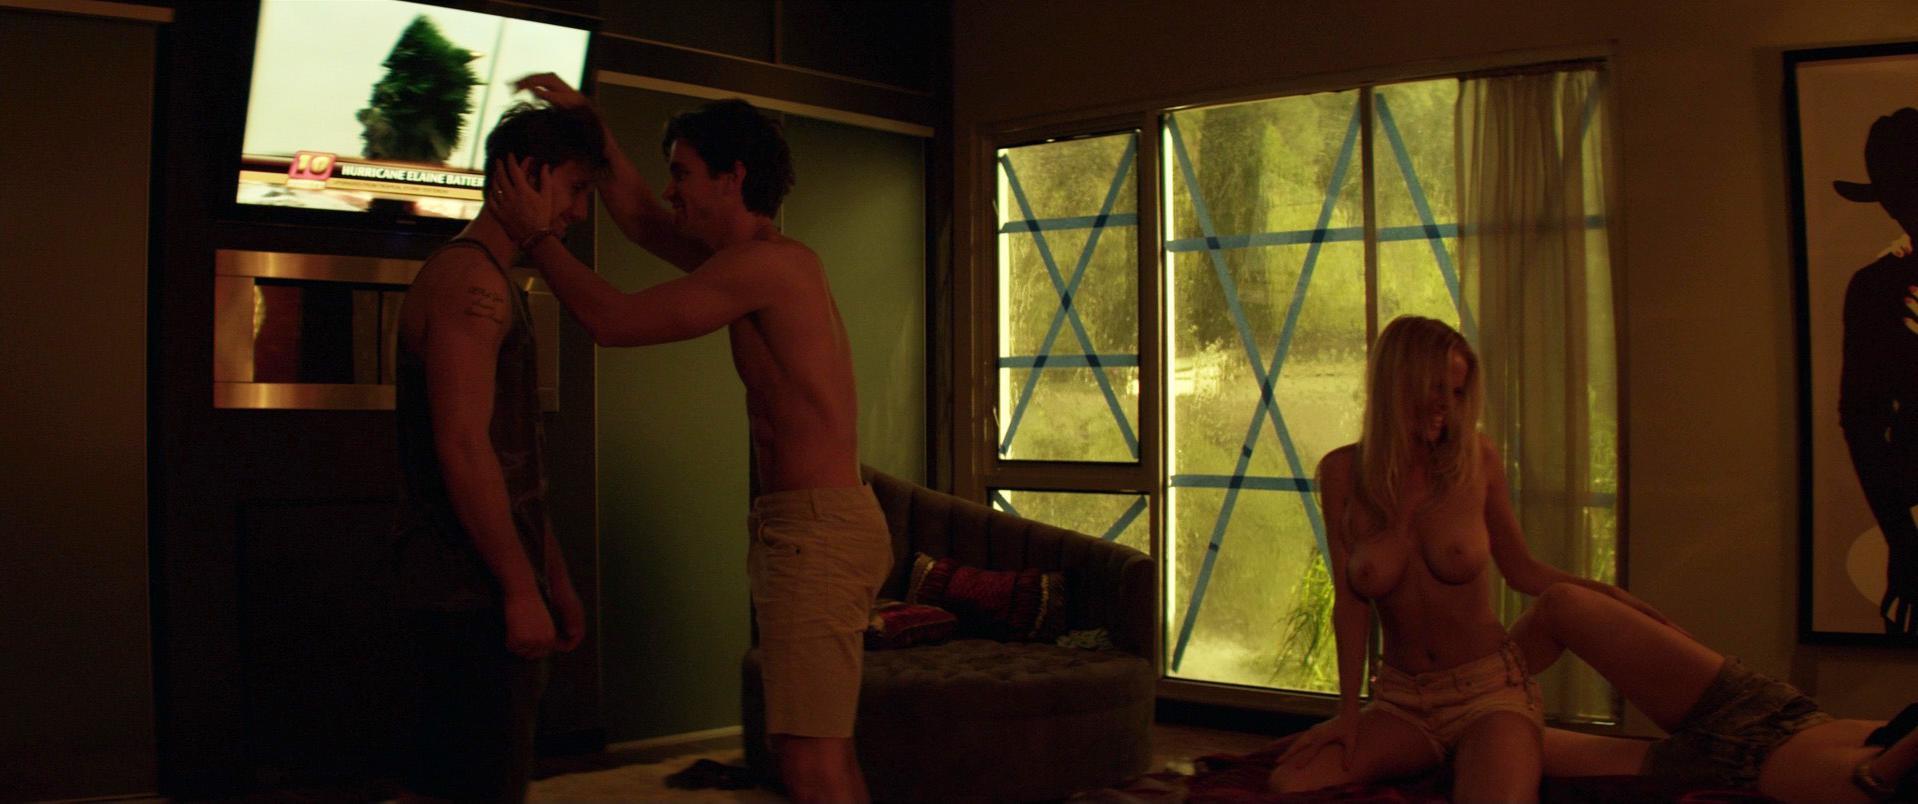 Mircea Monroe nude - Magic Mike (2012)